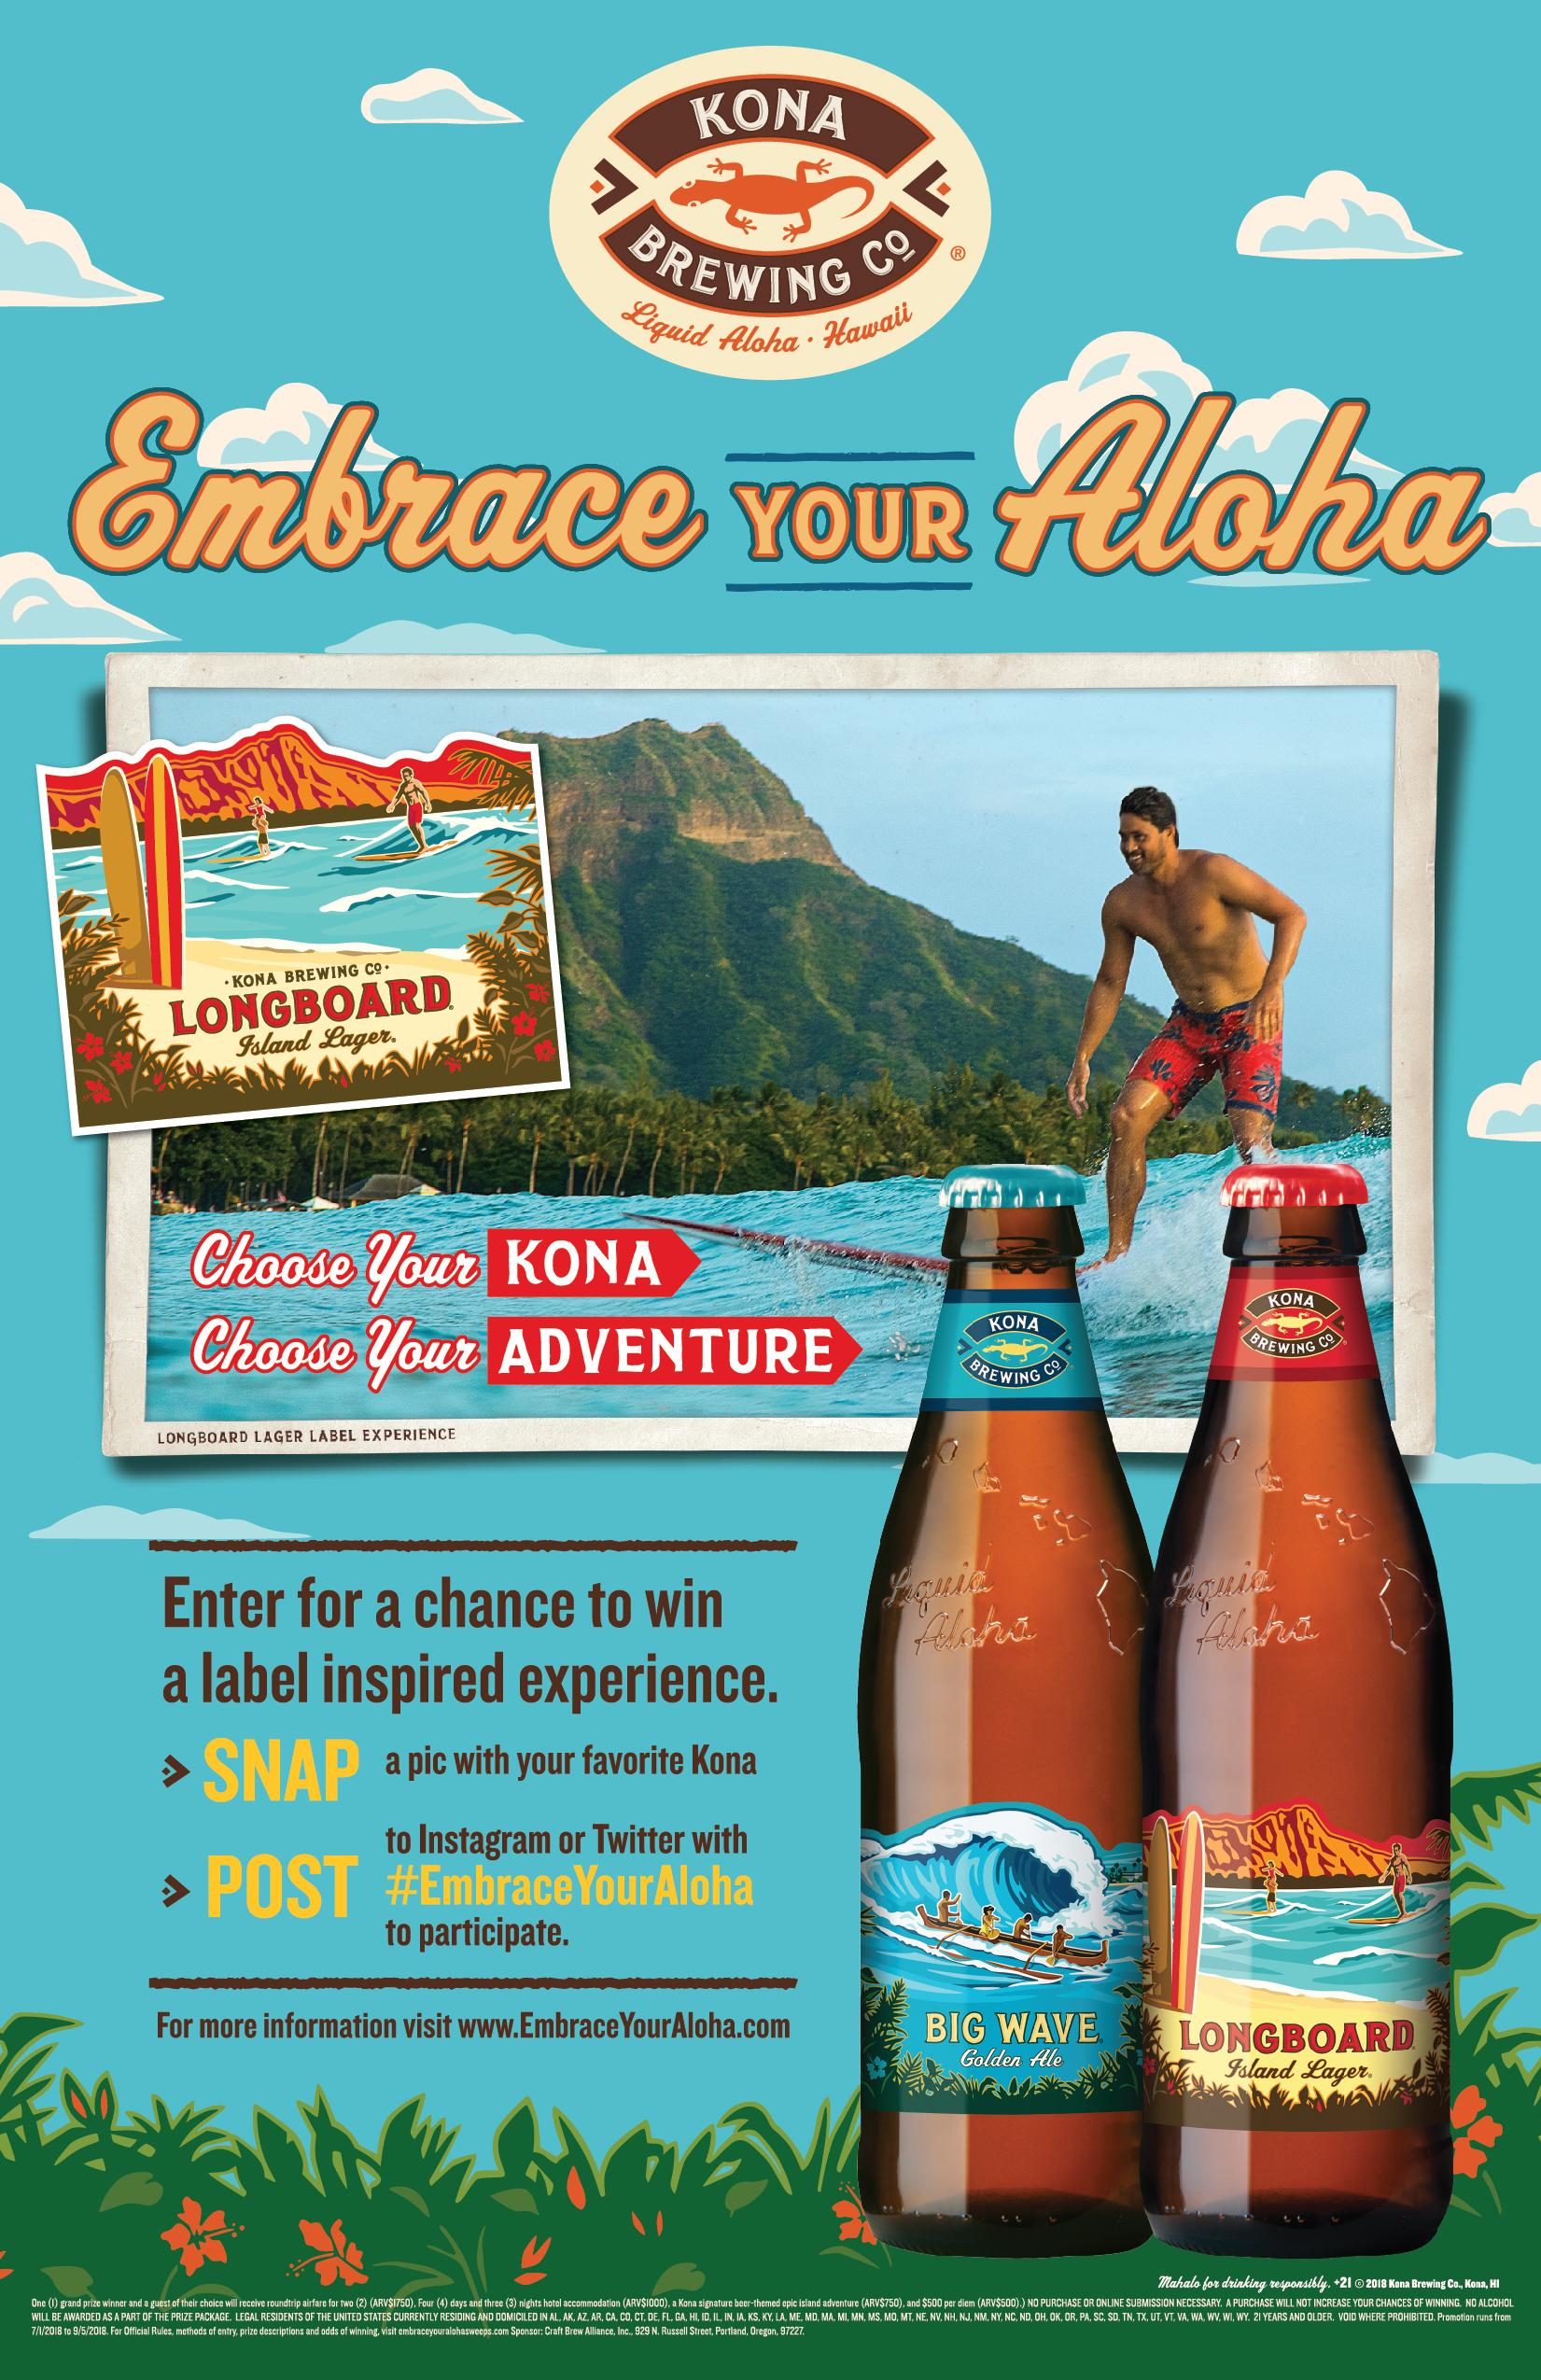 KO T2 2018 Embrace Your Aloha 4 core banner 11×17 031218